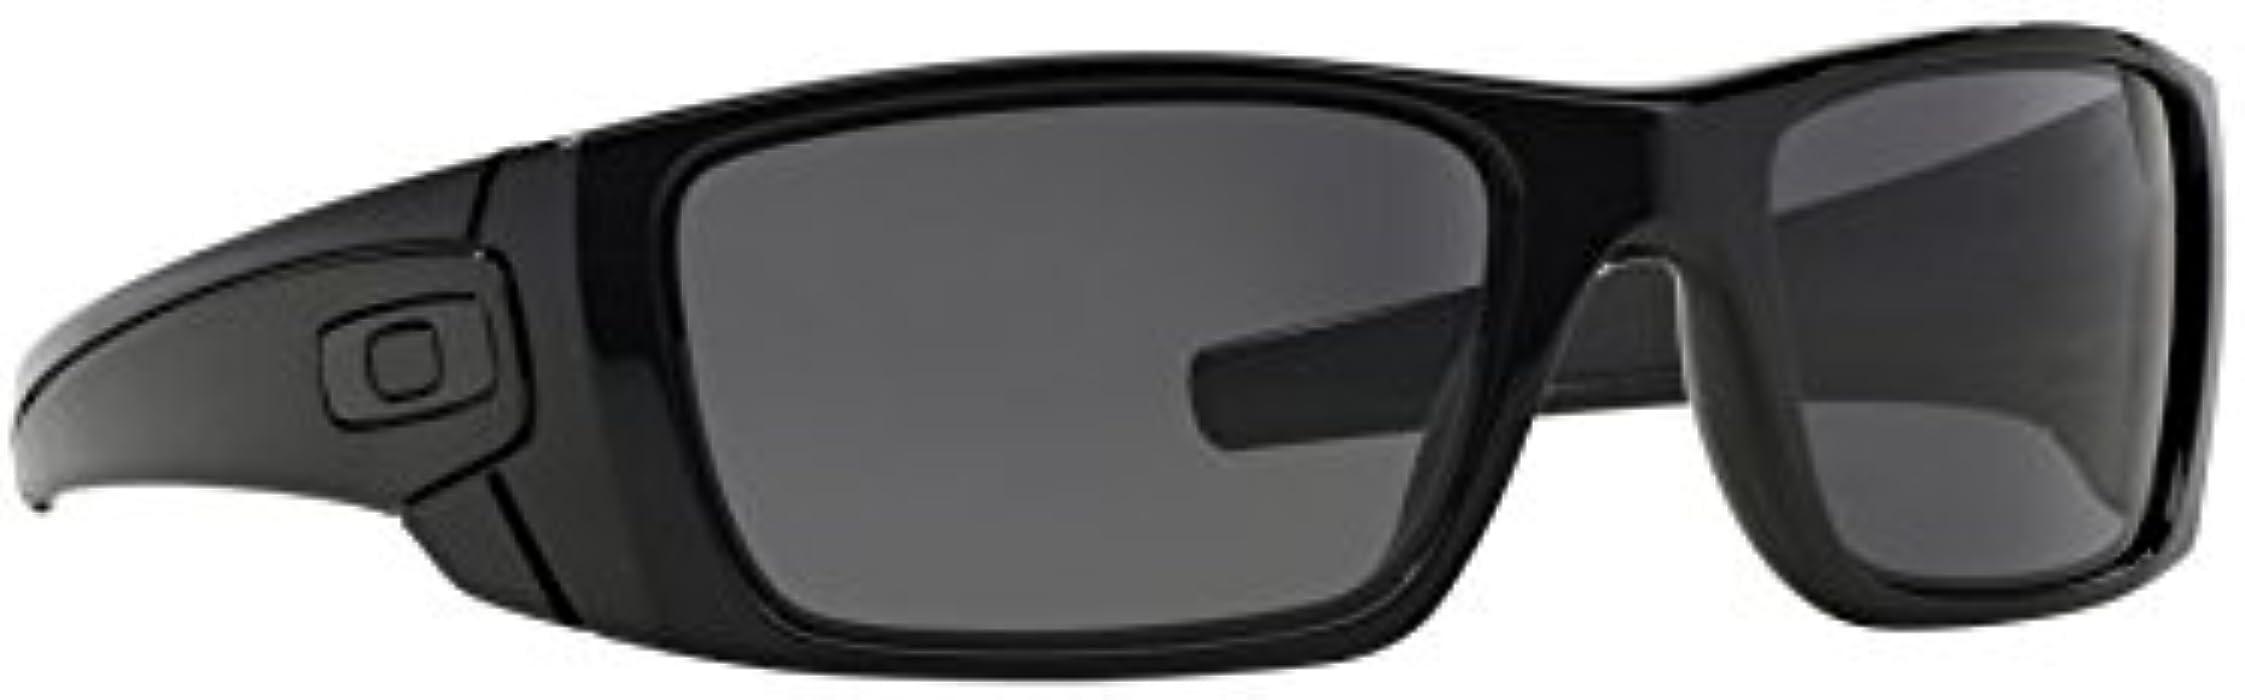 Oakley FUEL CELL™ OO9096 01 Black Sports Sunglass for Men